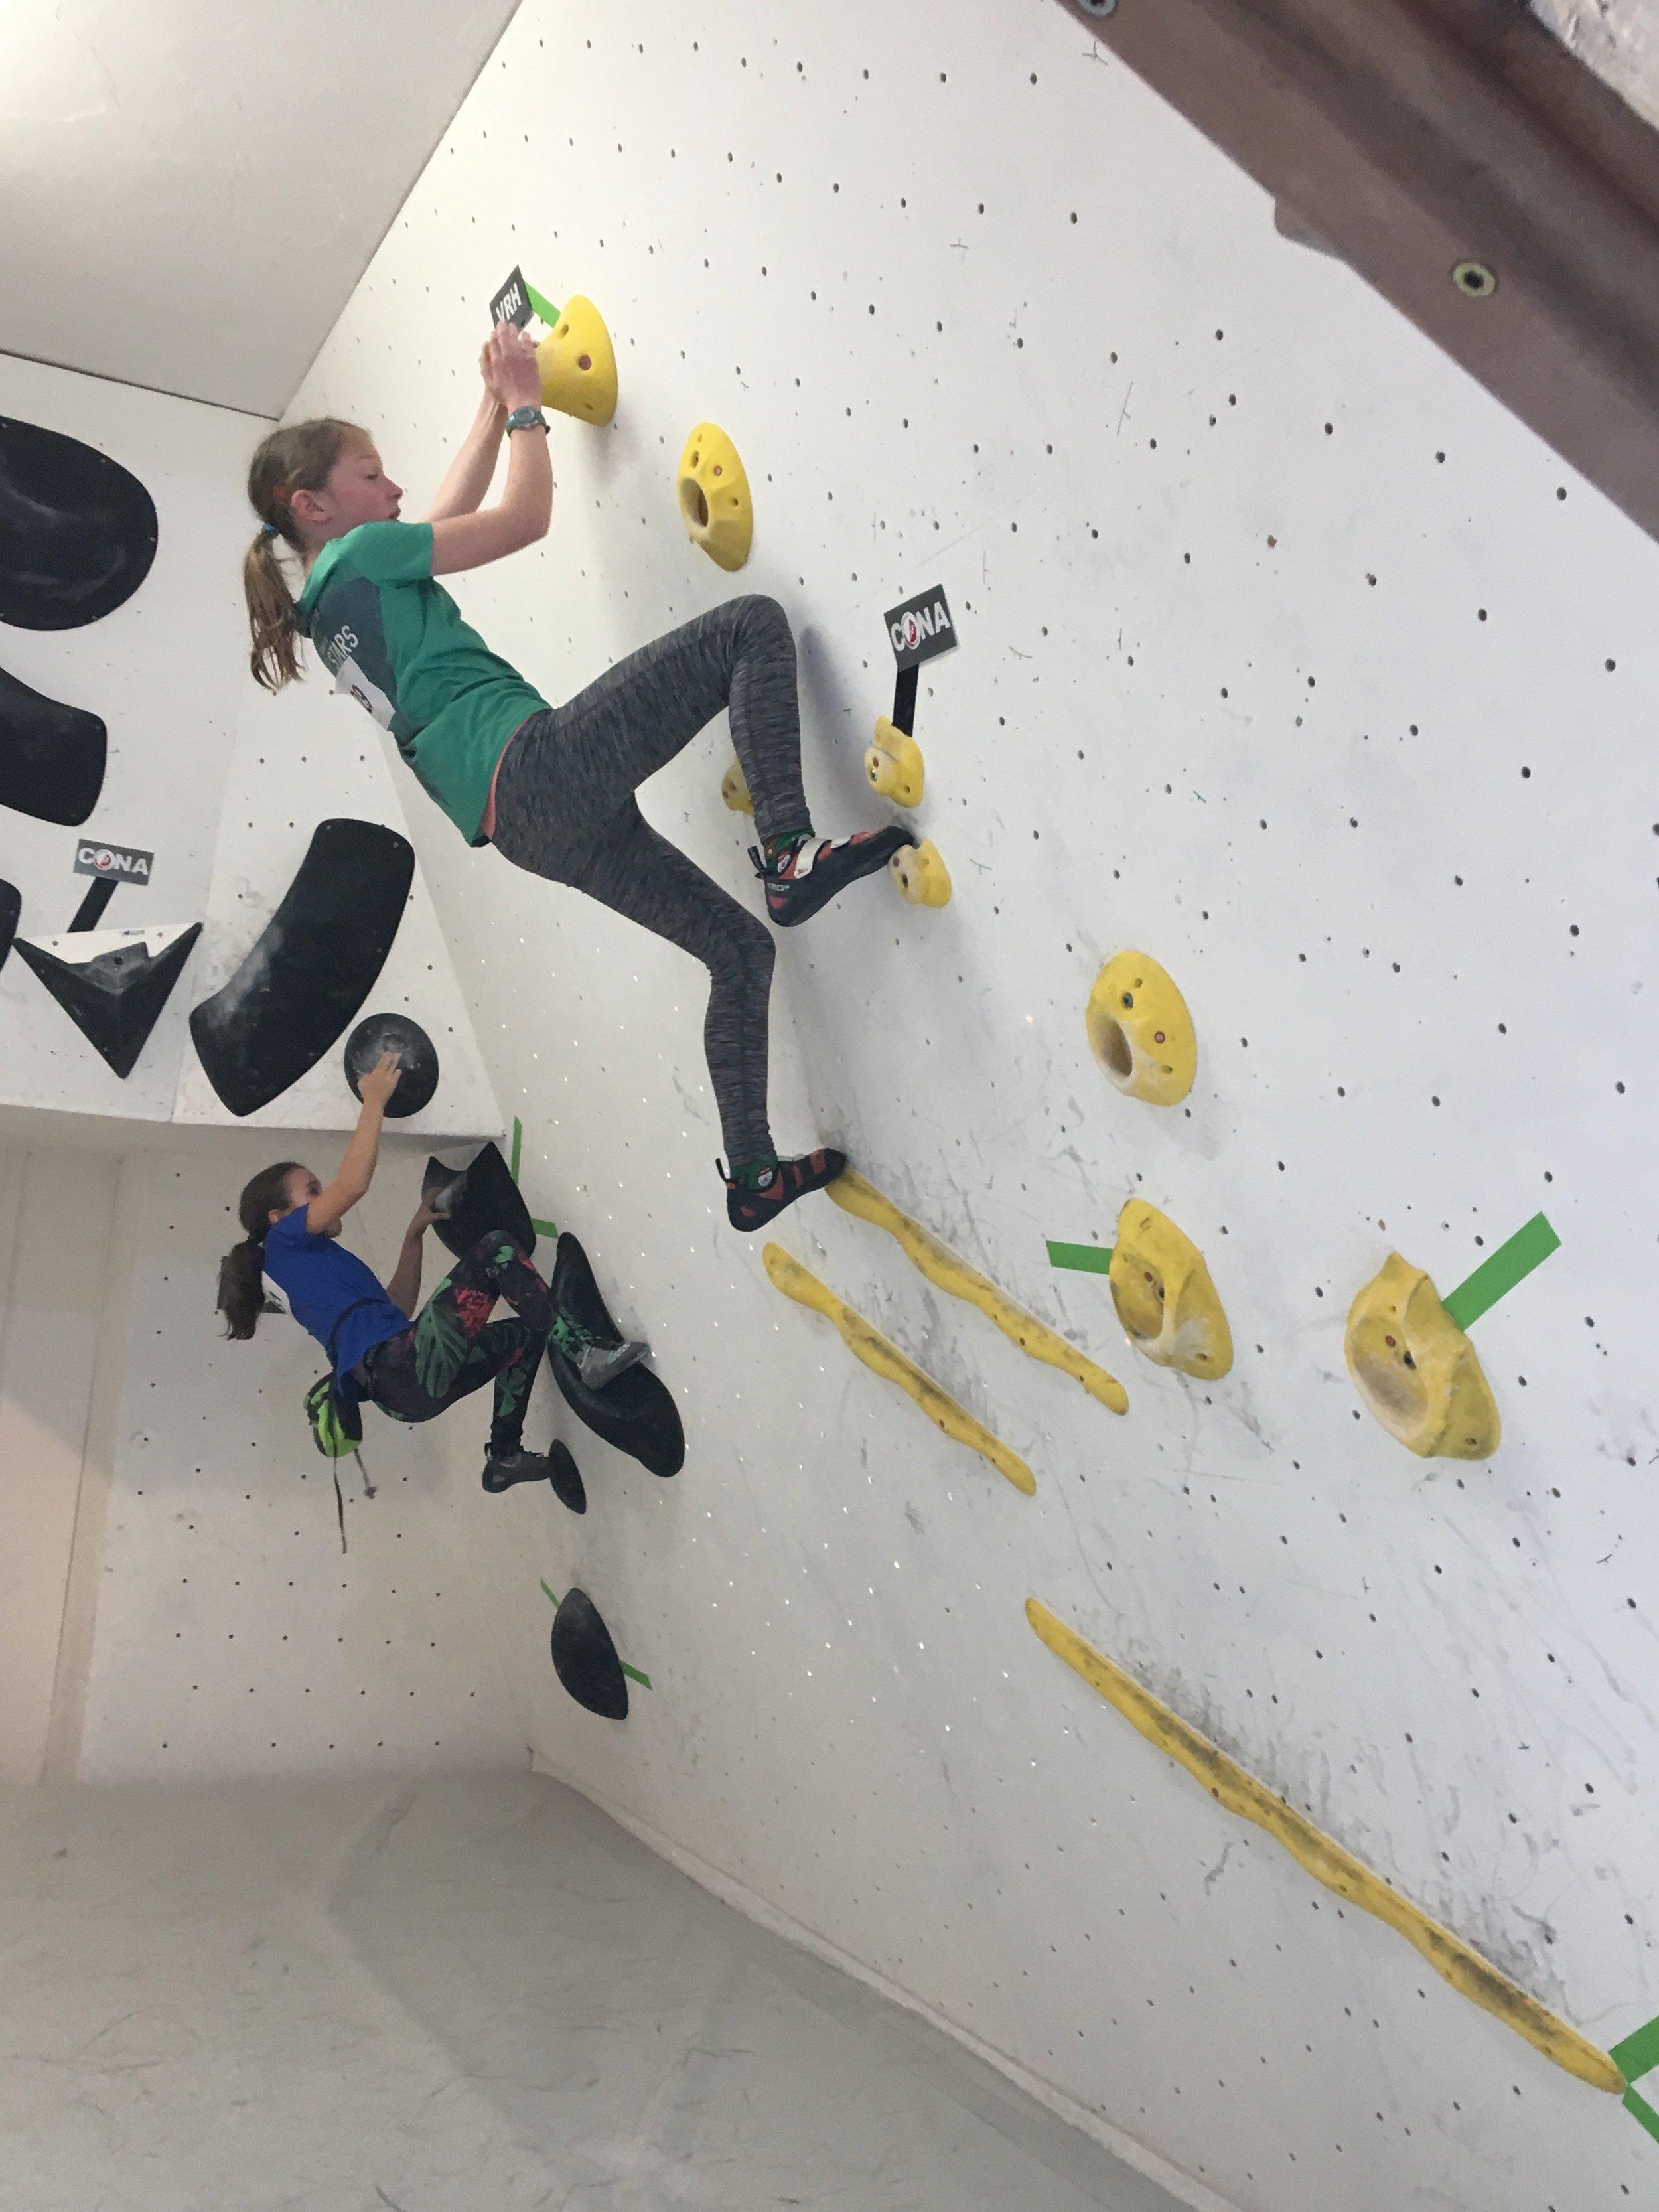 Plezalni tekma Grif Kamnik 2019_195.jpg